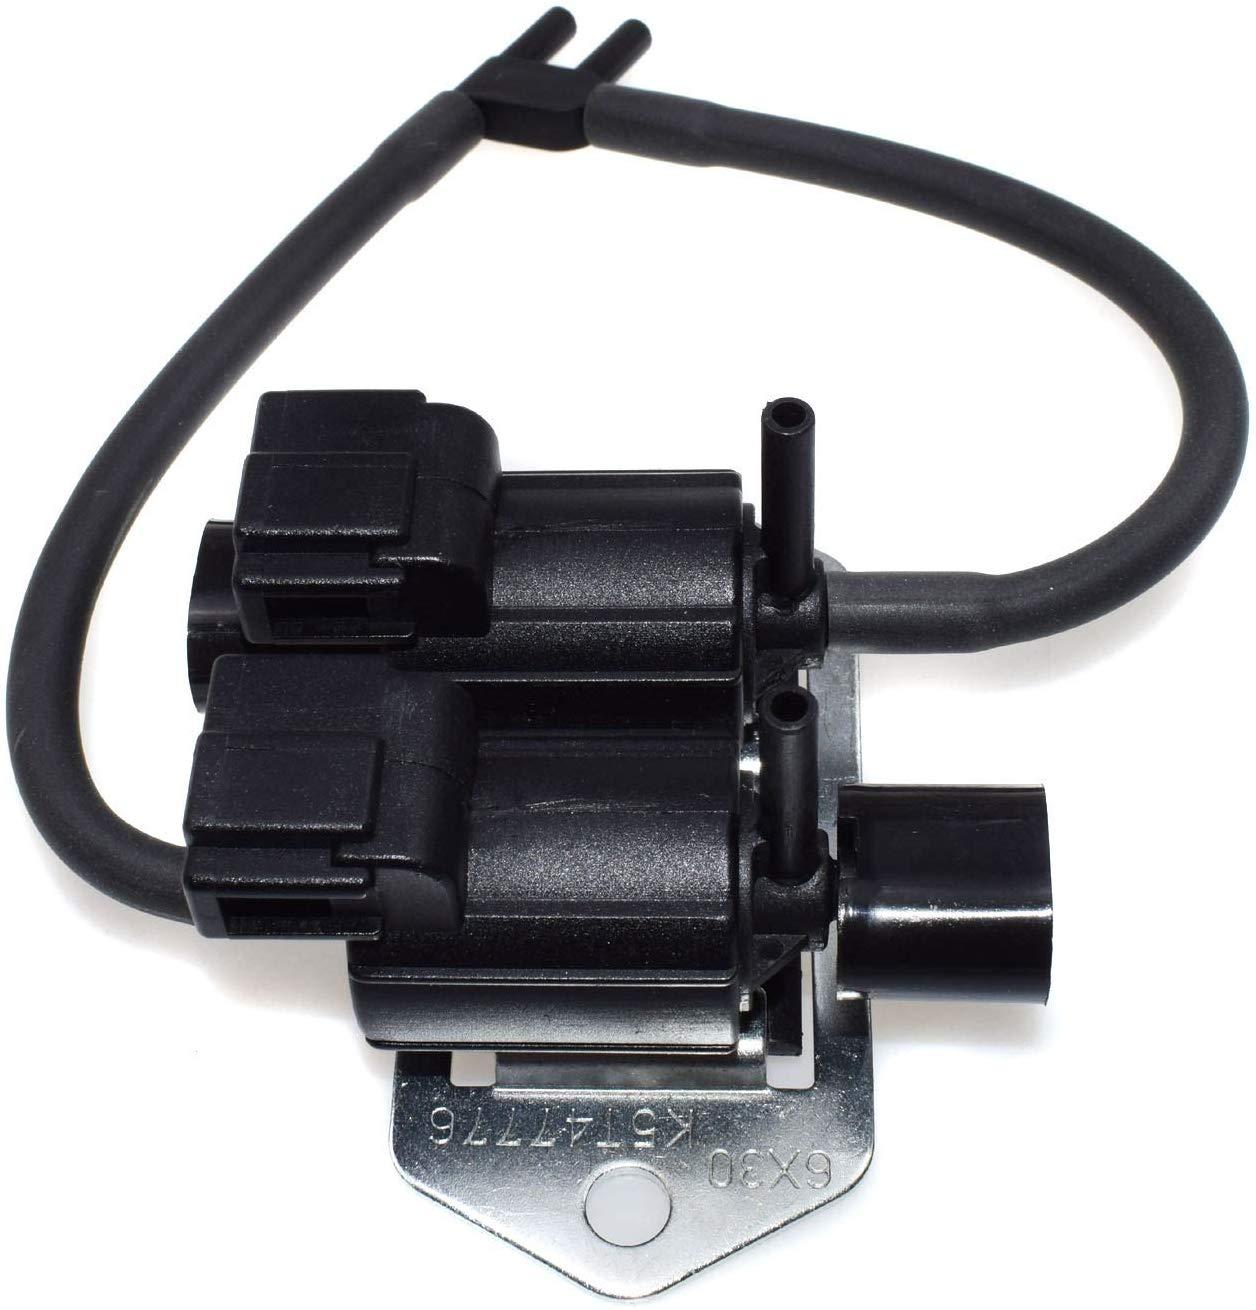 Oem mb620532 mr130381 k5t47776 k5t81794 da válvula do solenóide do interruptor de controle do vácuo para mitsubishi montero 3.5l/3.8l 2001-2006